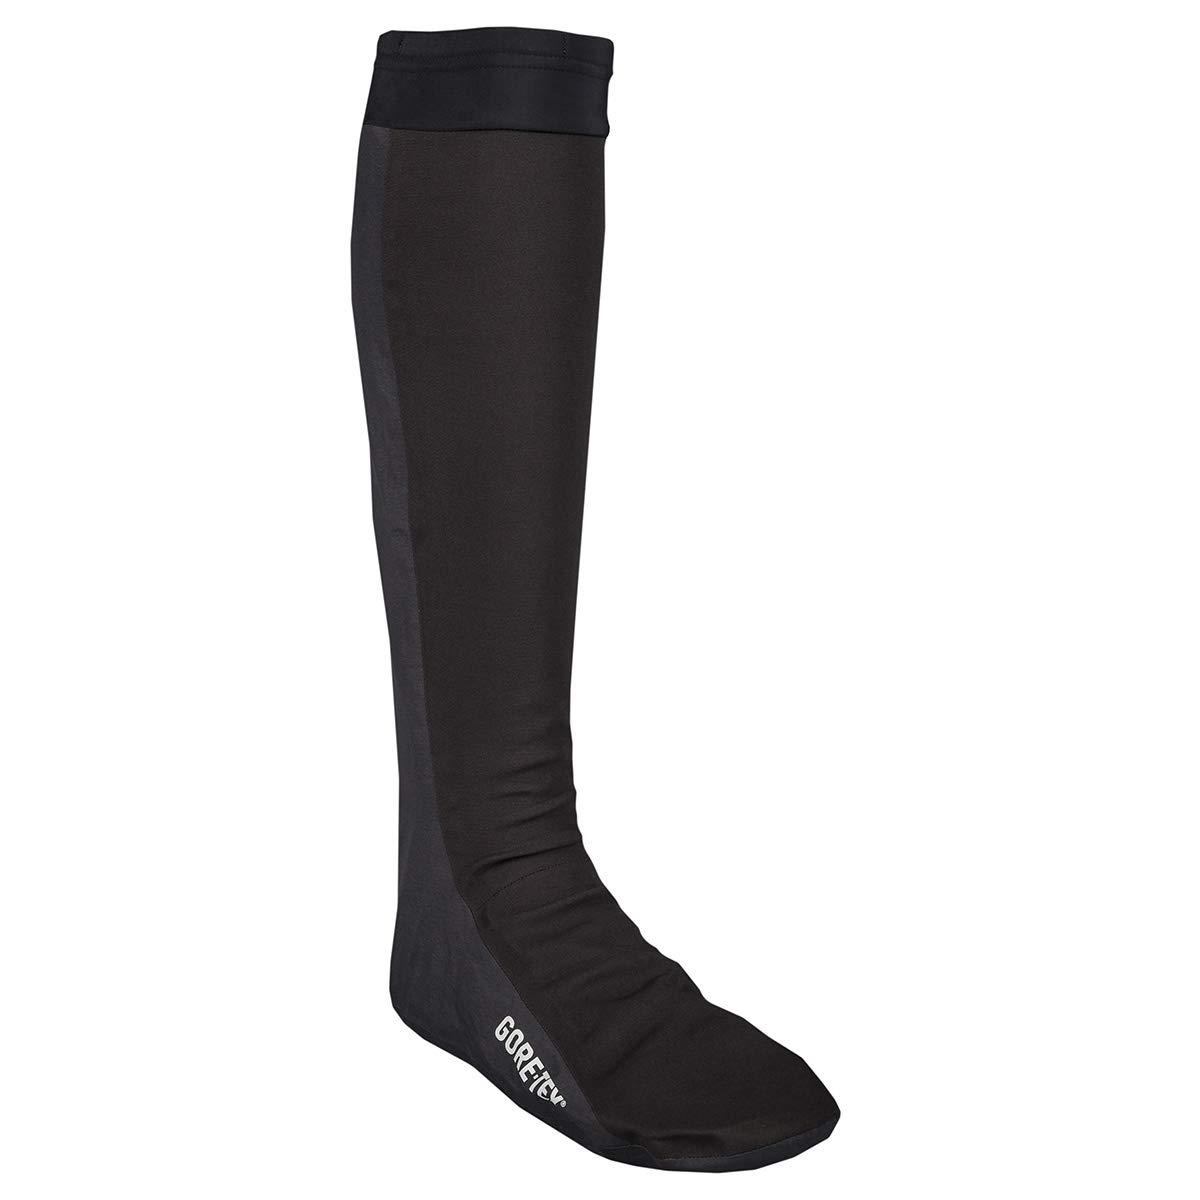 KLIM Covert Gore-Tex Sock LG Black 3079-001-140-000